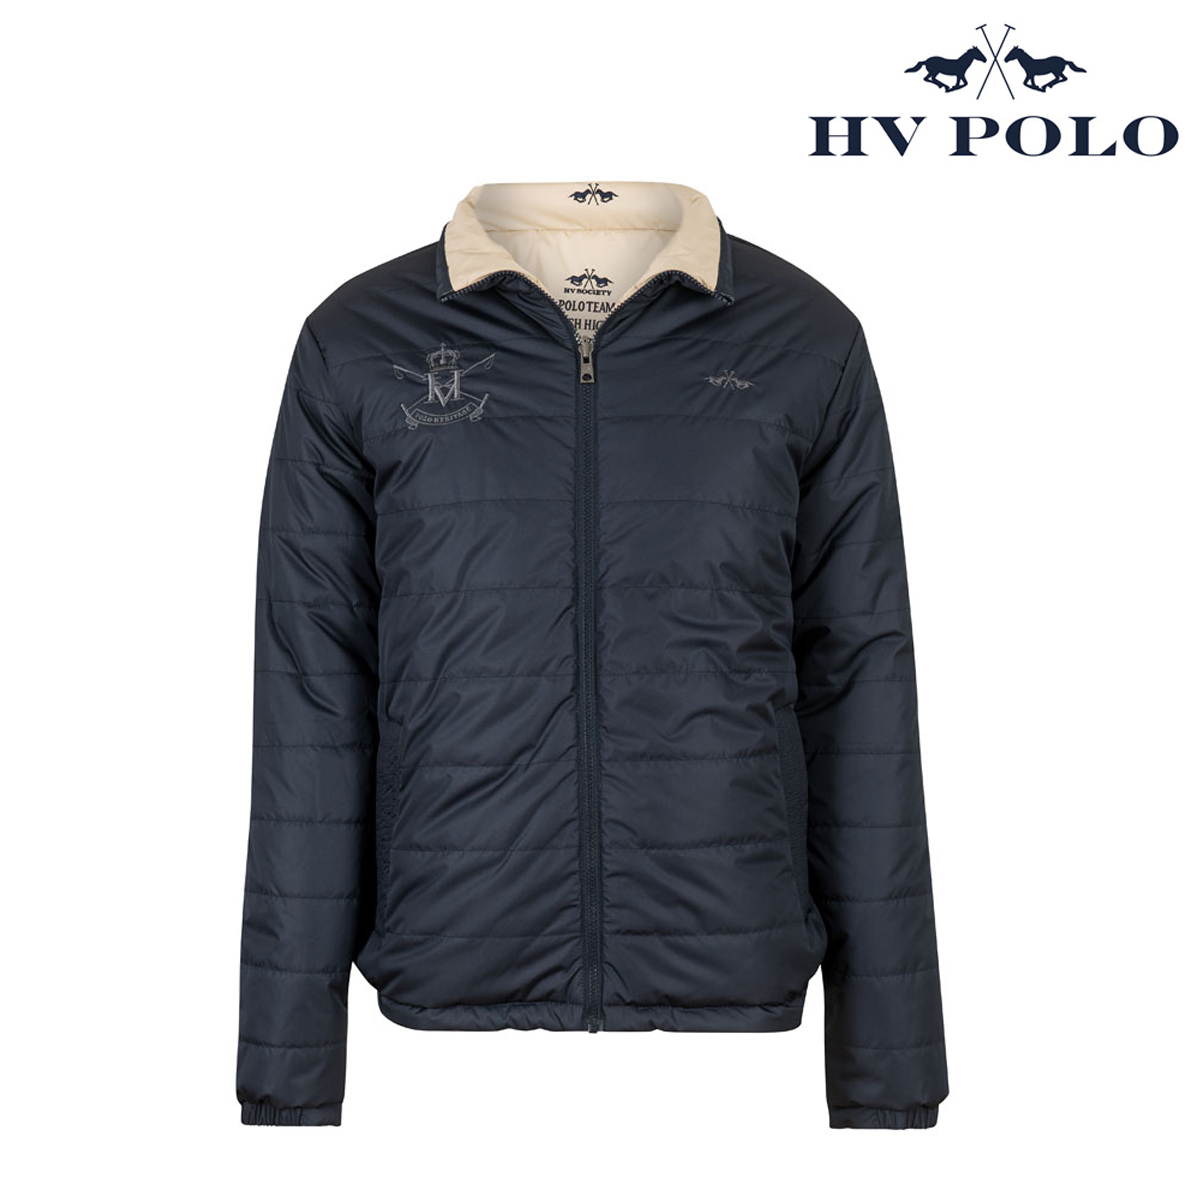 HV Polo Walrick Mens Jacket **SALE** **FREE UK Shipping**